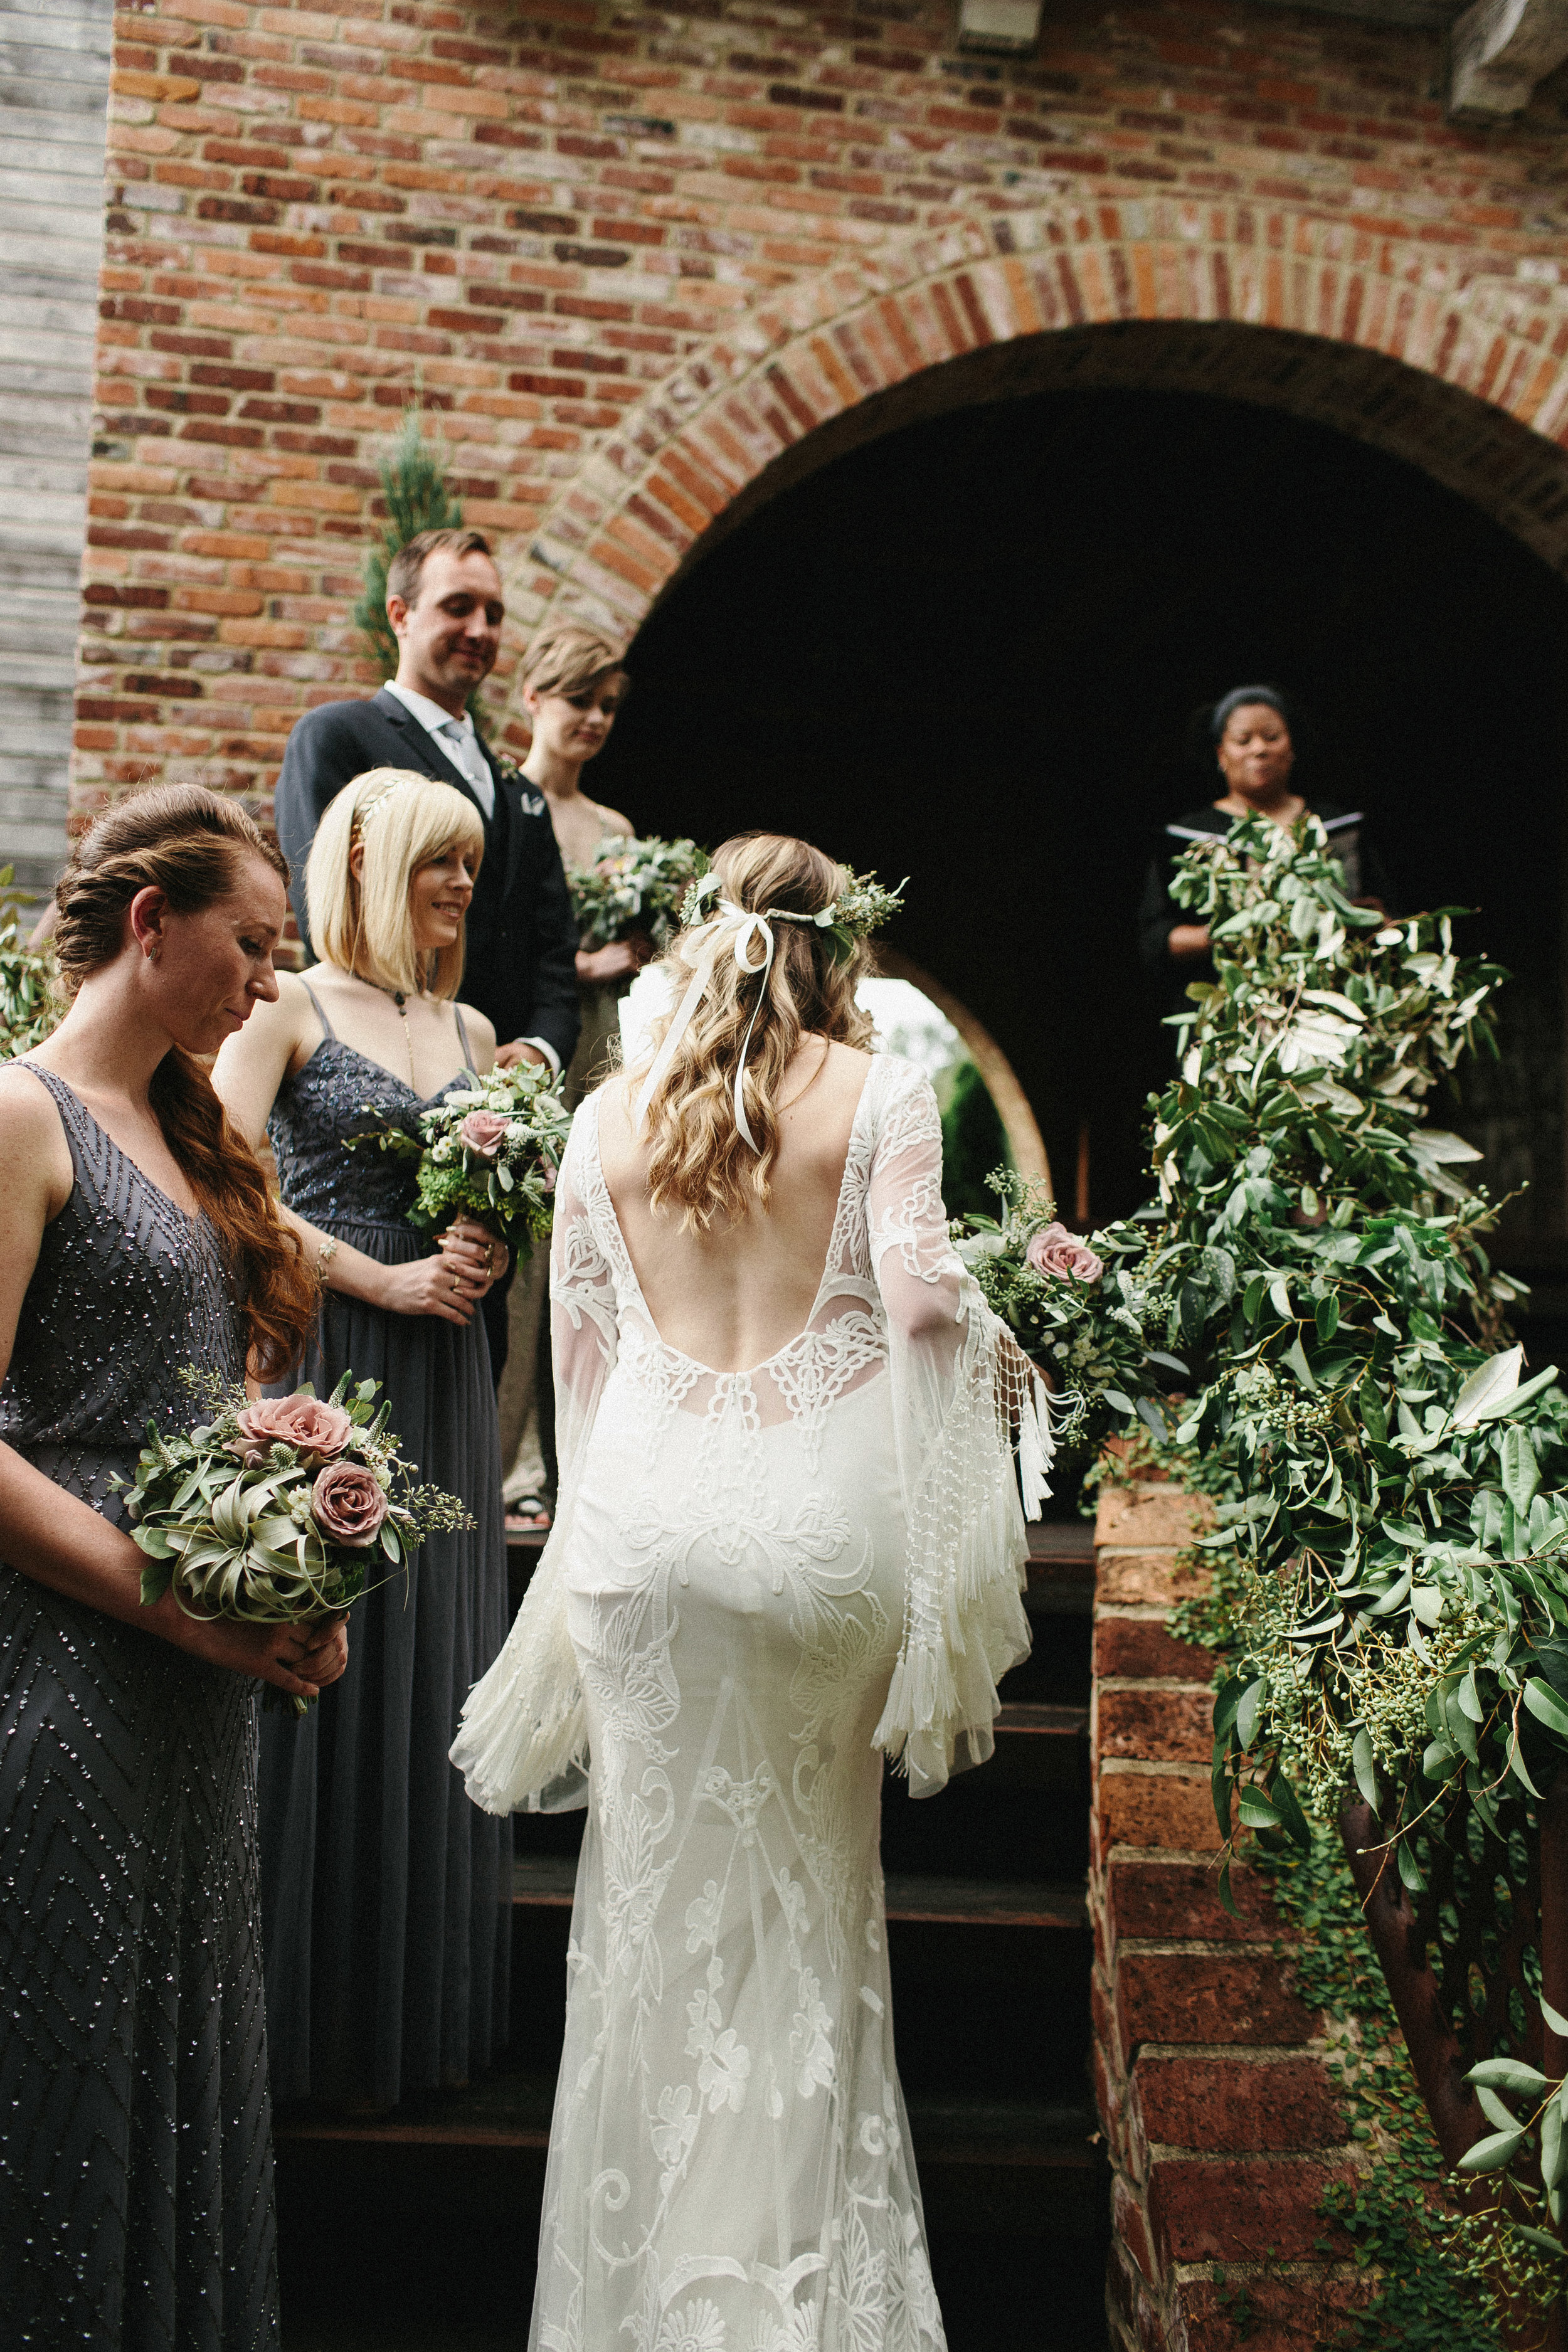 cherry_hollow_farms_industrial_unique_venue_georgia_serenbe_wedding_boho_midsummer_nights_dream_river_west_2061.jpg